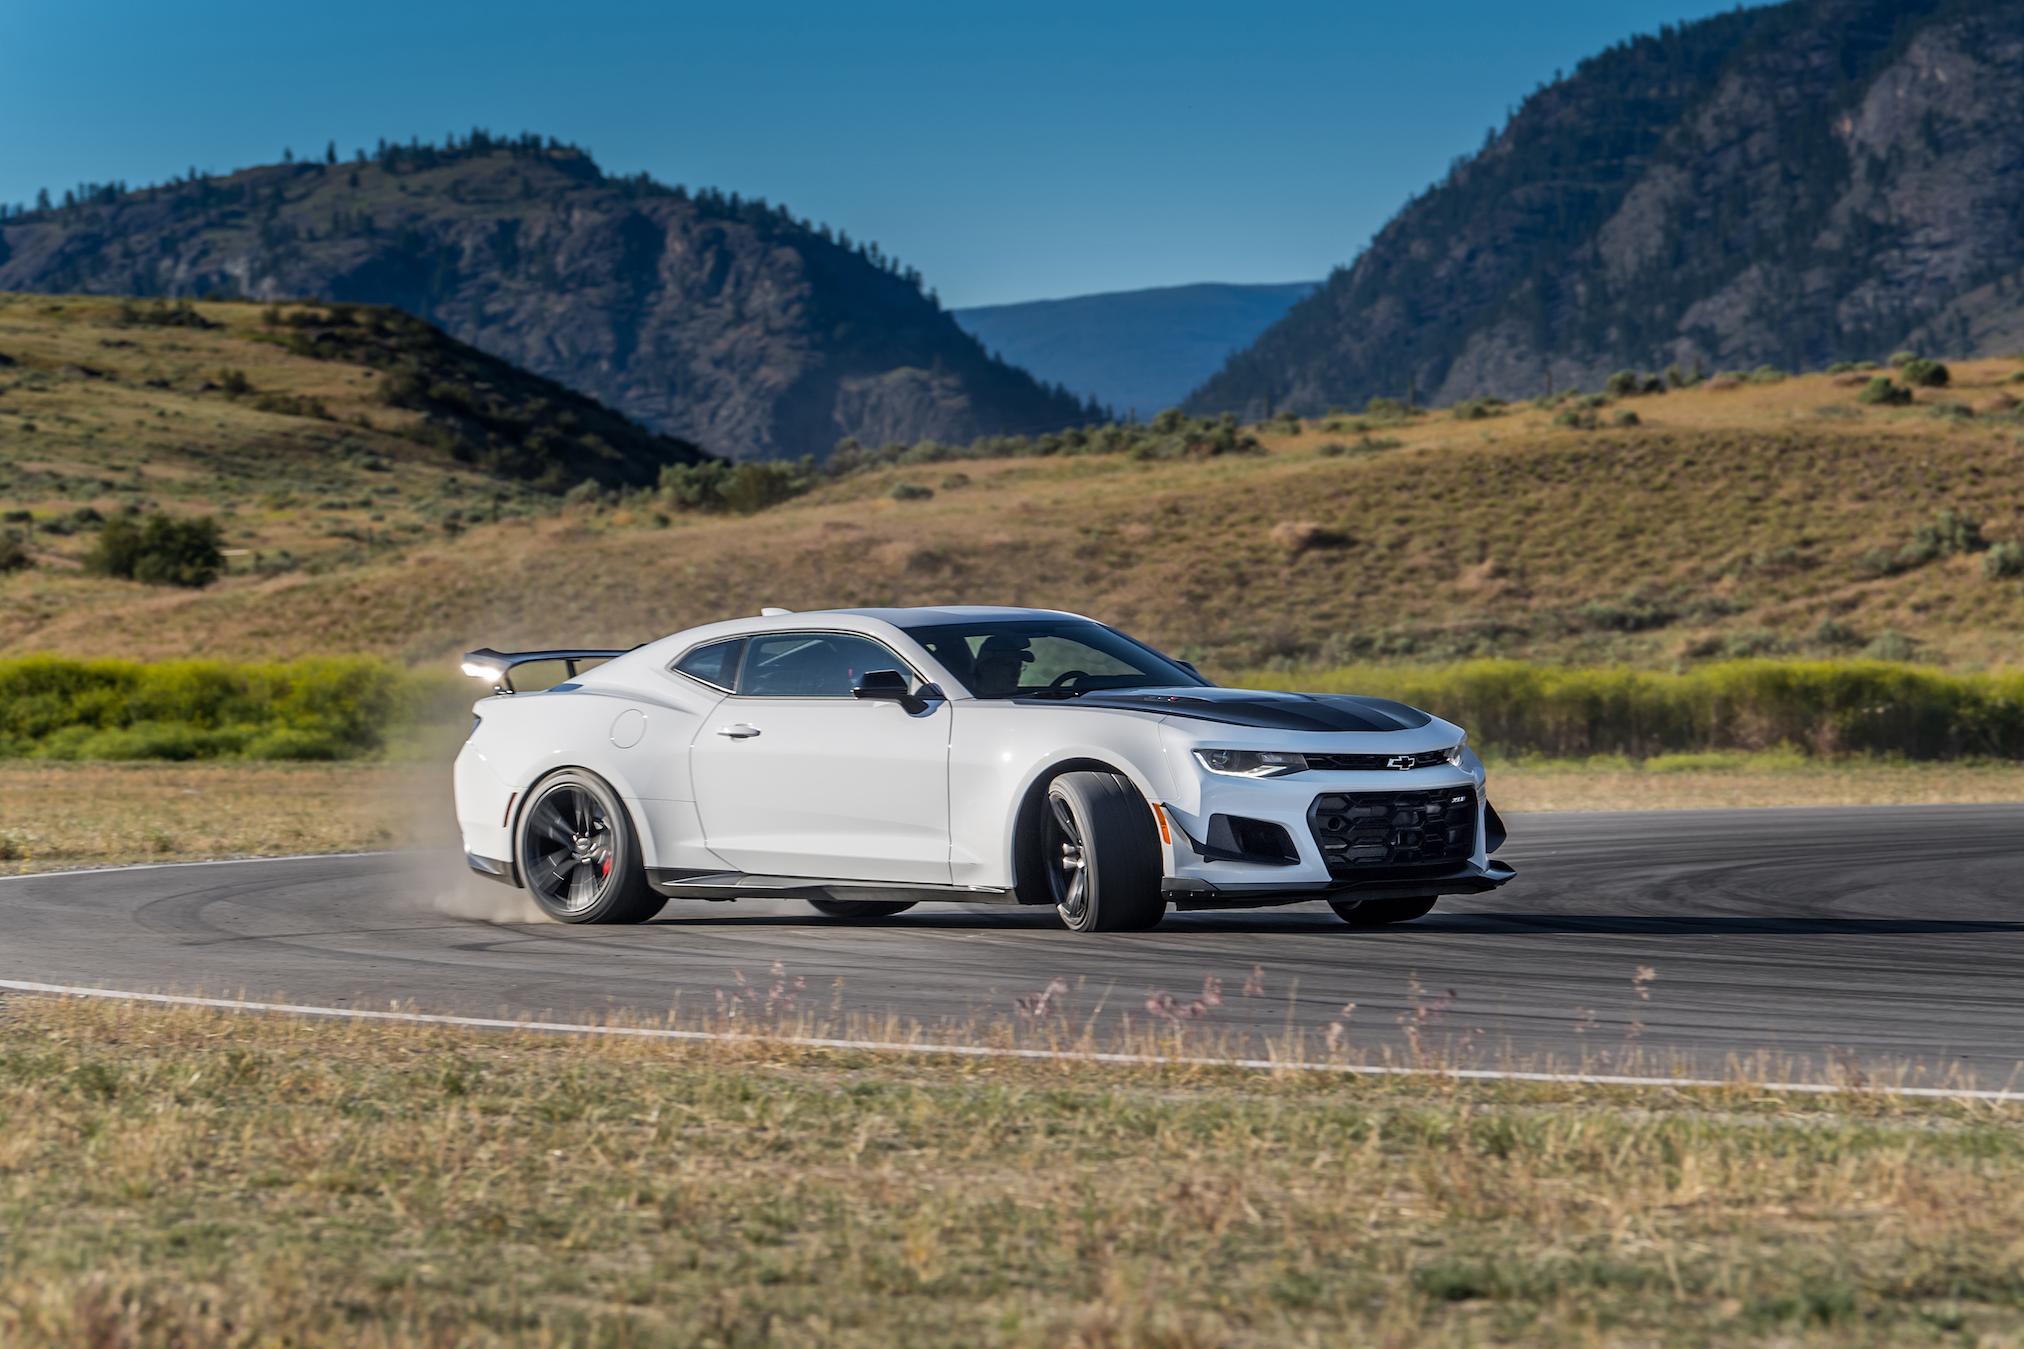 Camaro goes nuclear Chevrolet escalates the muscle car war